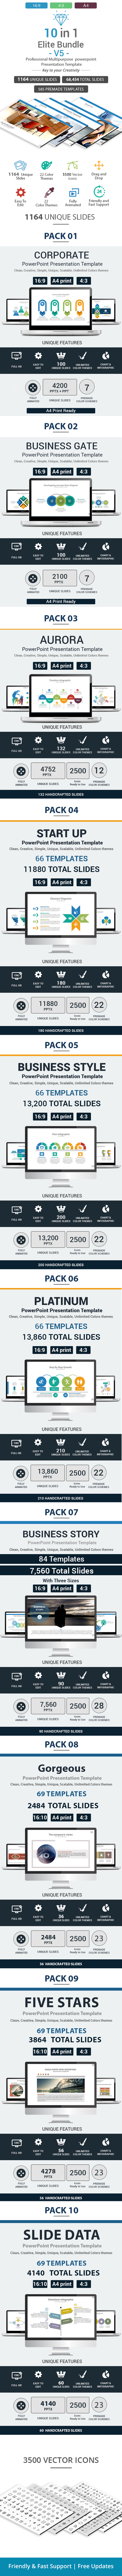 Elite-V5-10 in 1 PowerPoint Template Bundle